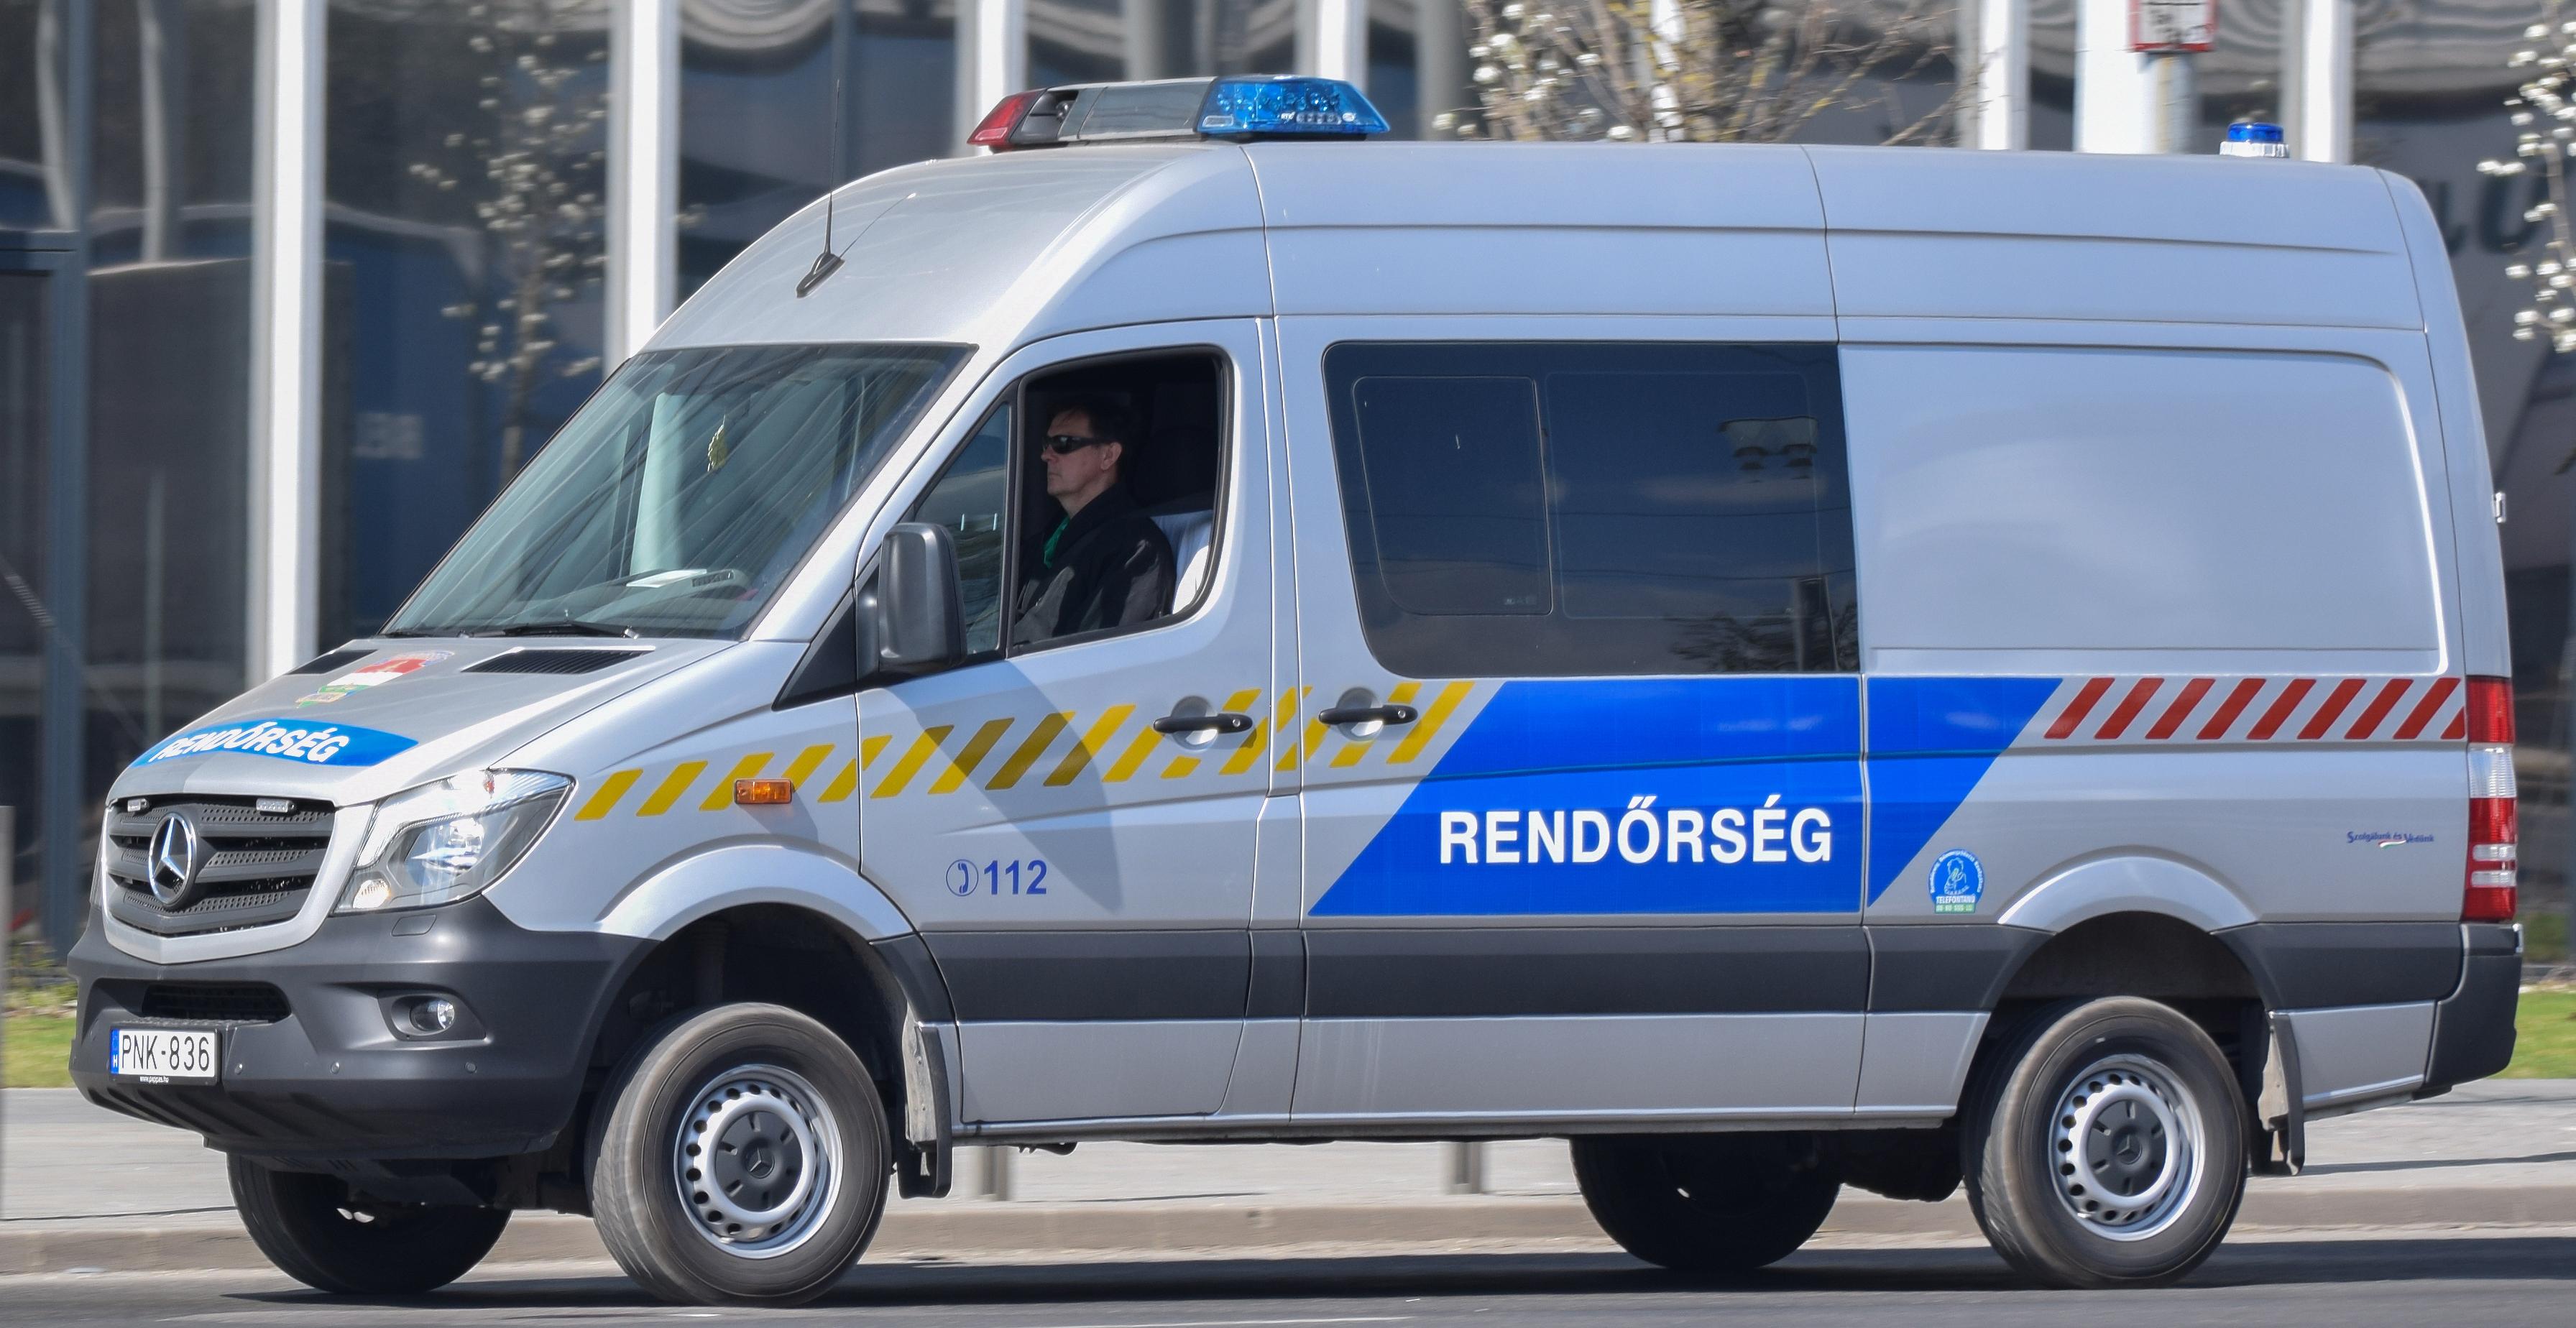 Drónt is bevetett a rendőrség a Balatonnál - deeksha.hu